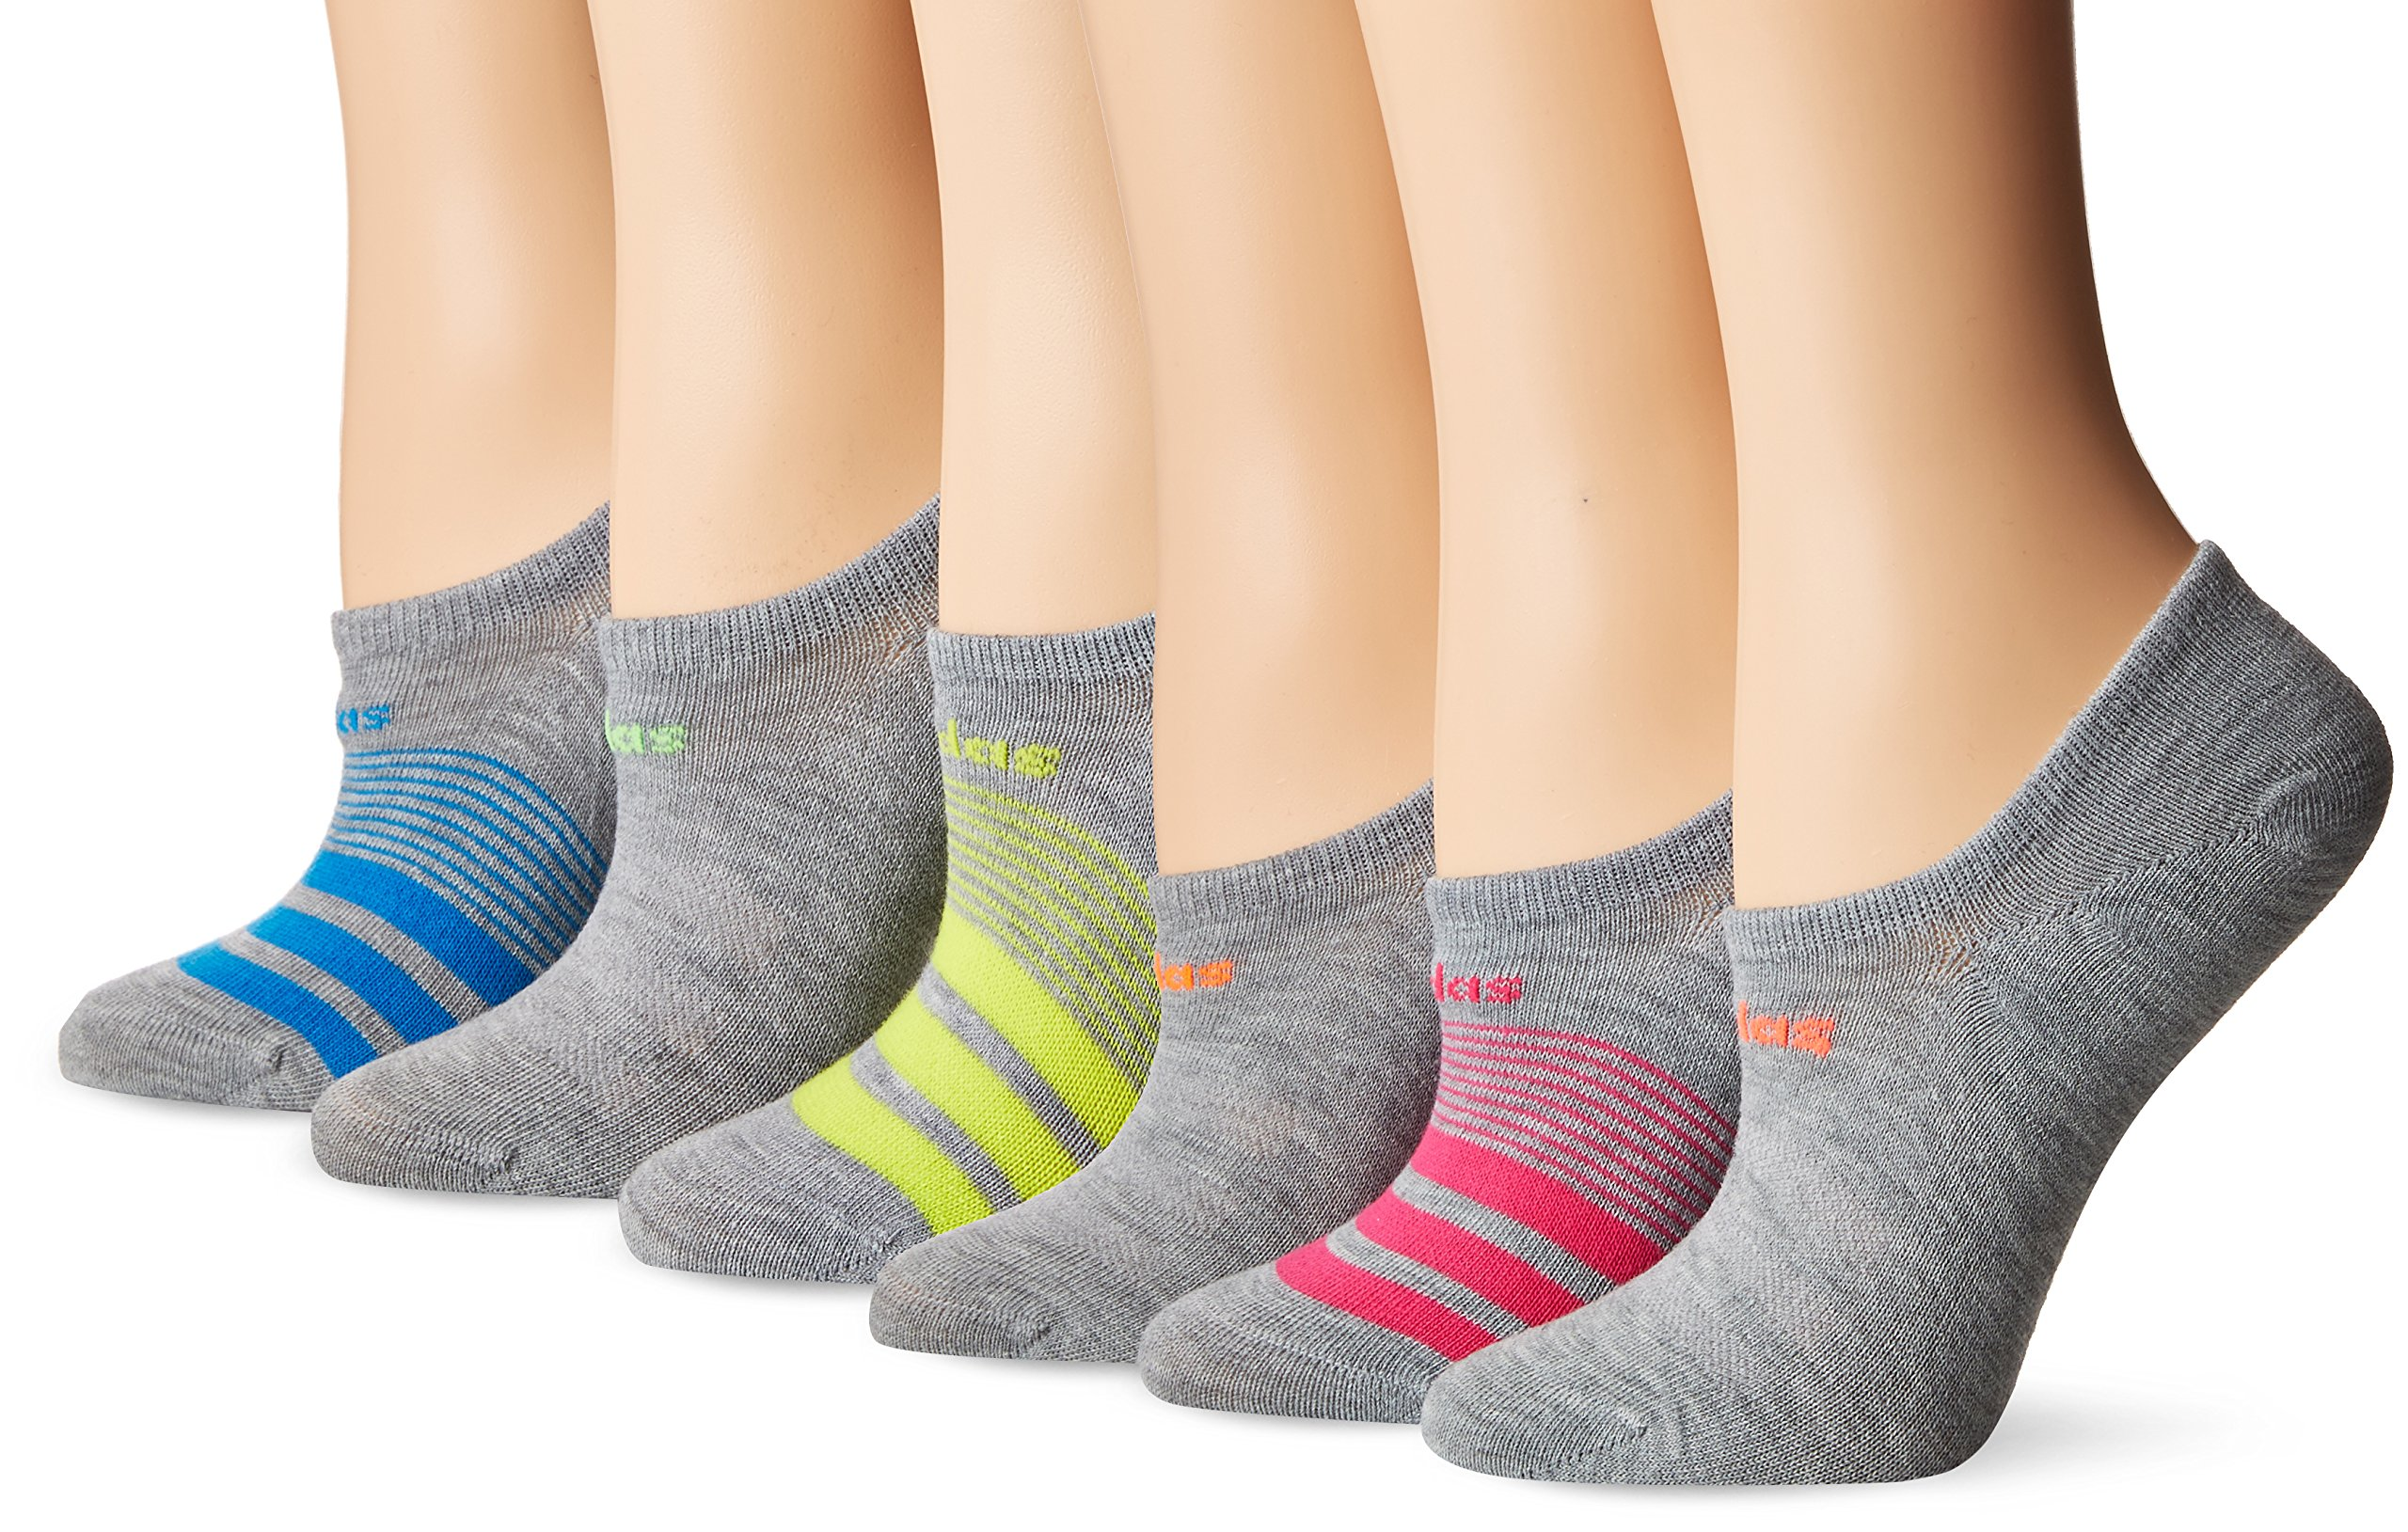 adidas Women's Superlite Super No Show Socks (6-Pack)